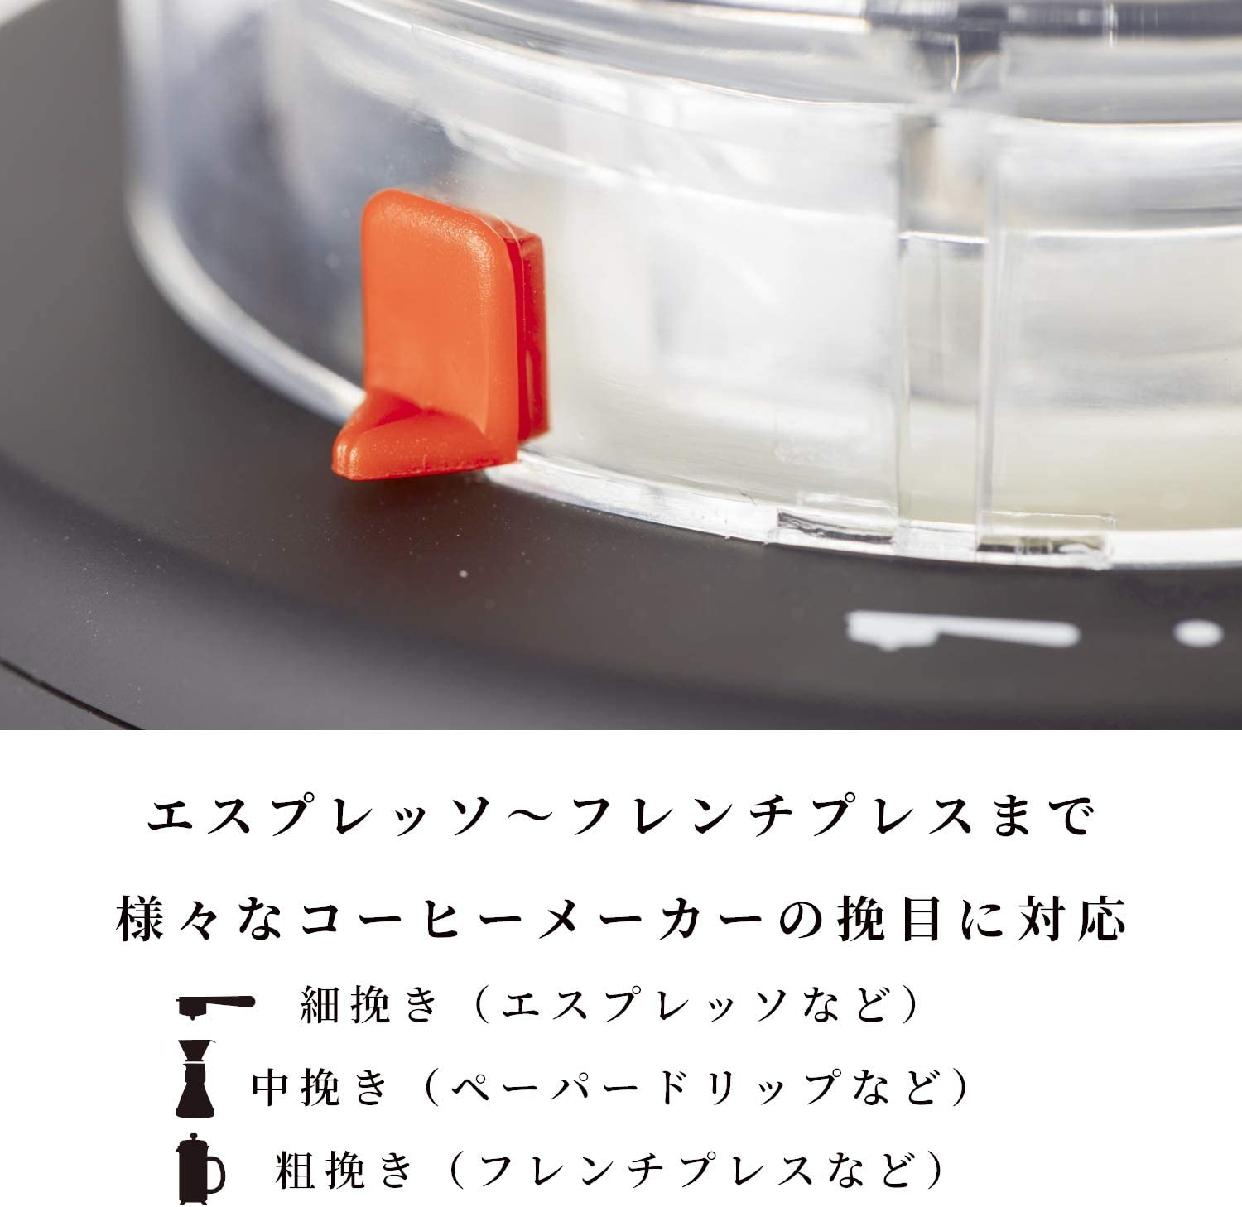 bodum(ボダム) BISTRO コーヒーグラインダー 10903-01JP-3の商品画像4